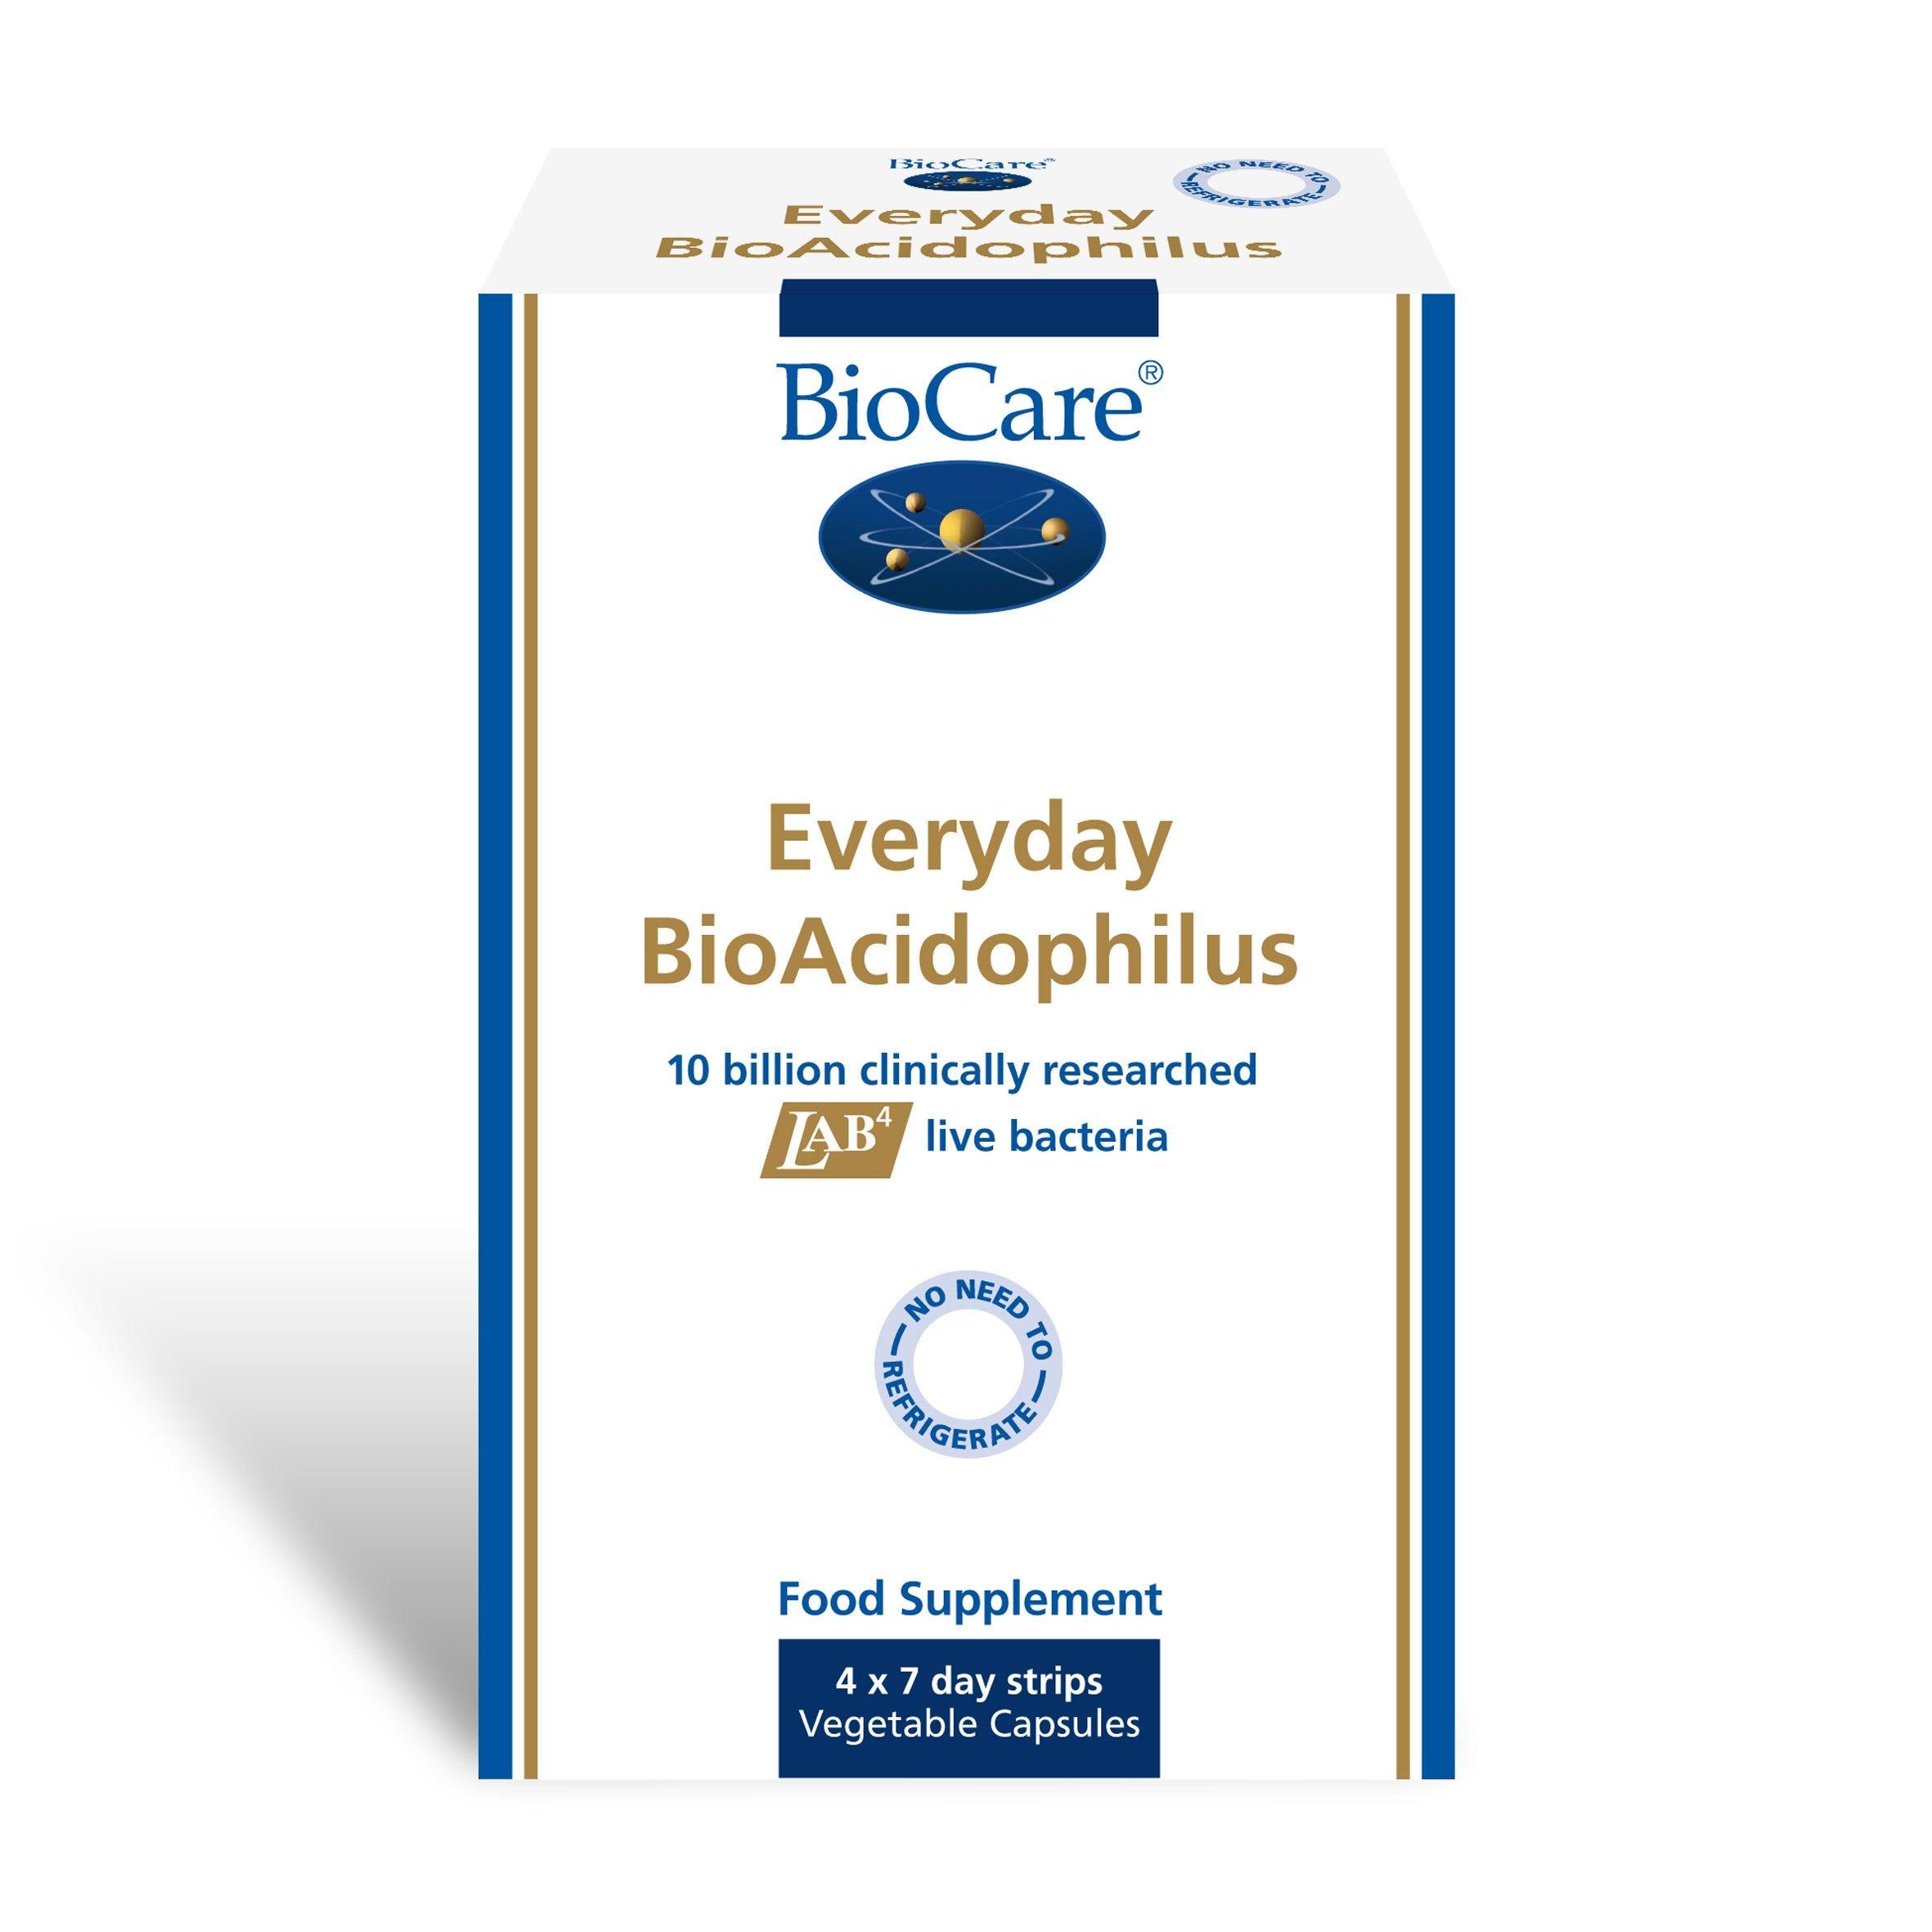 Everyday BioAcidophilus